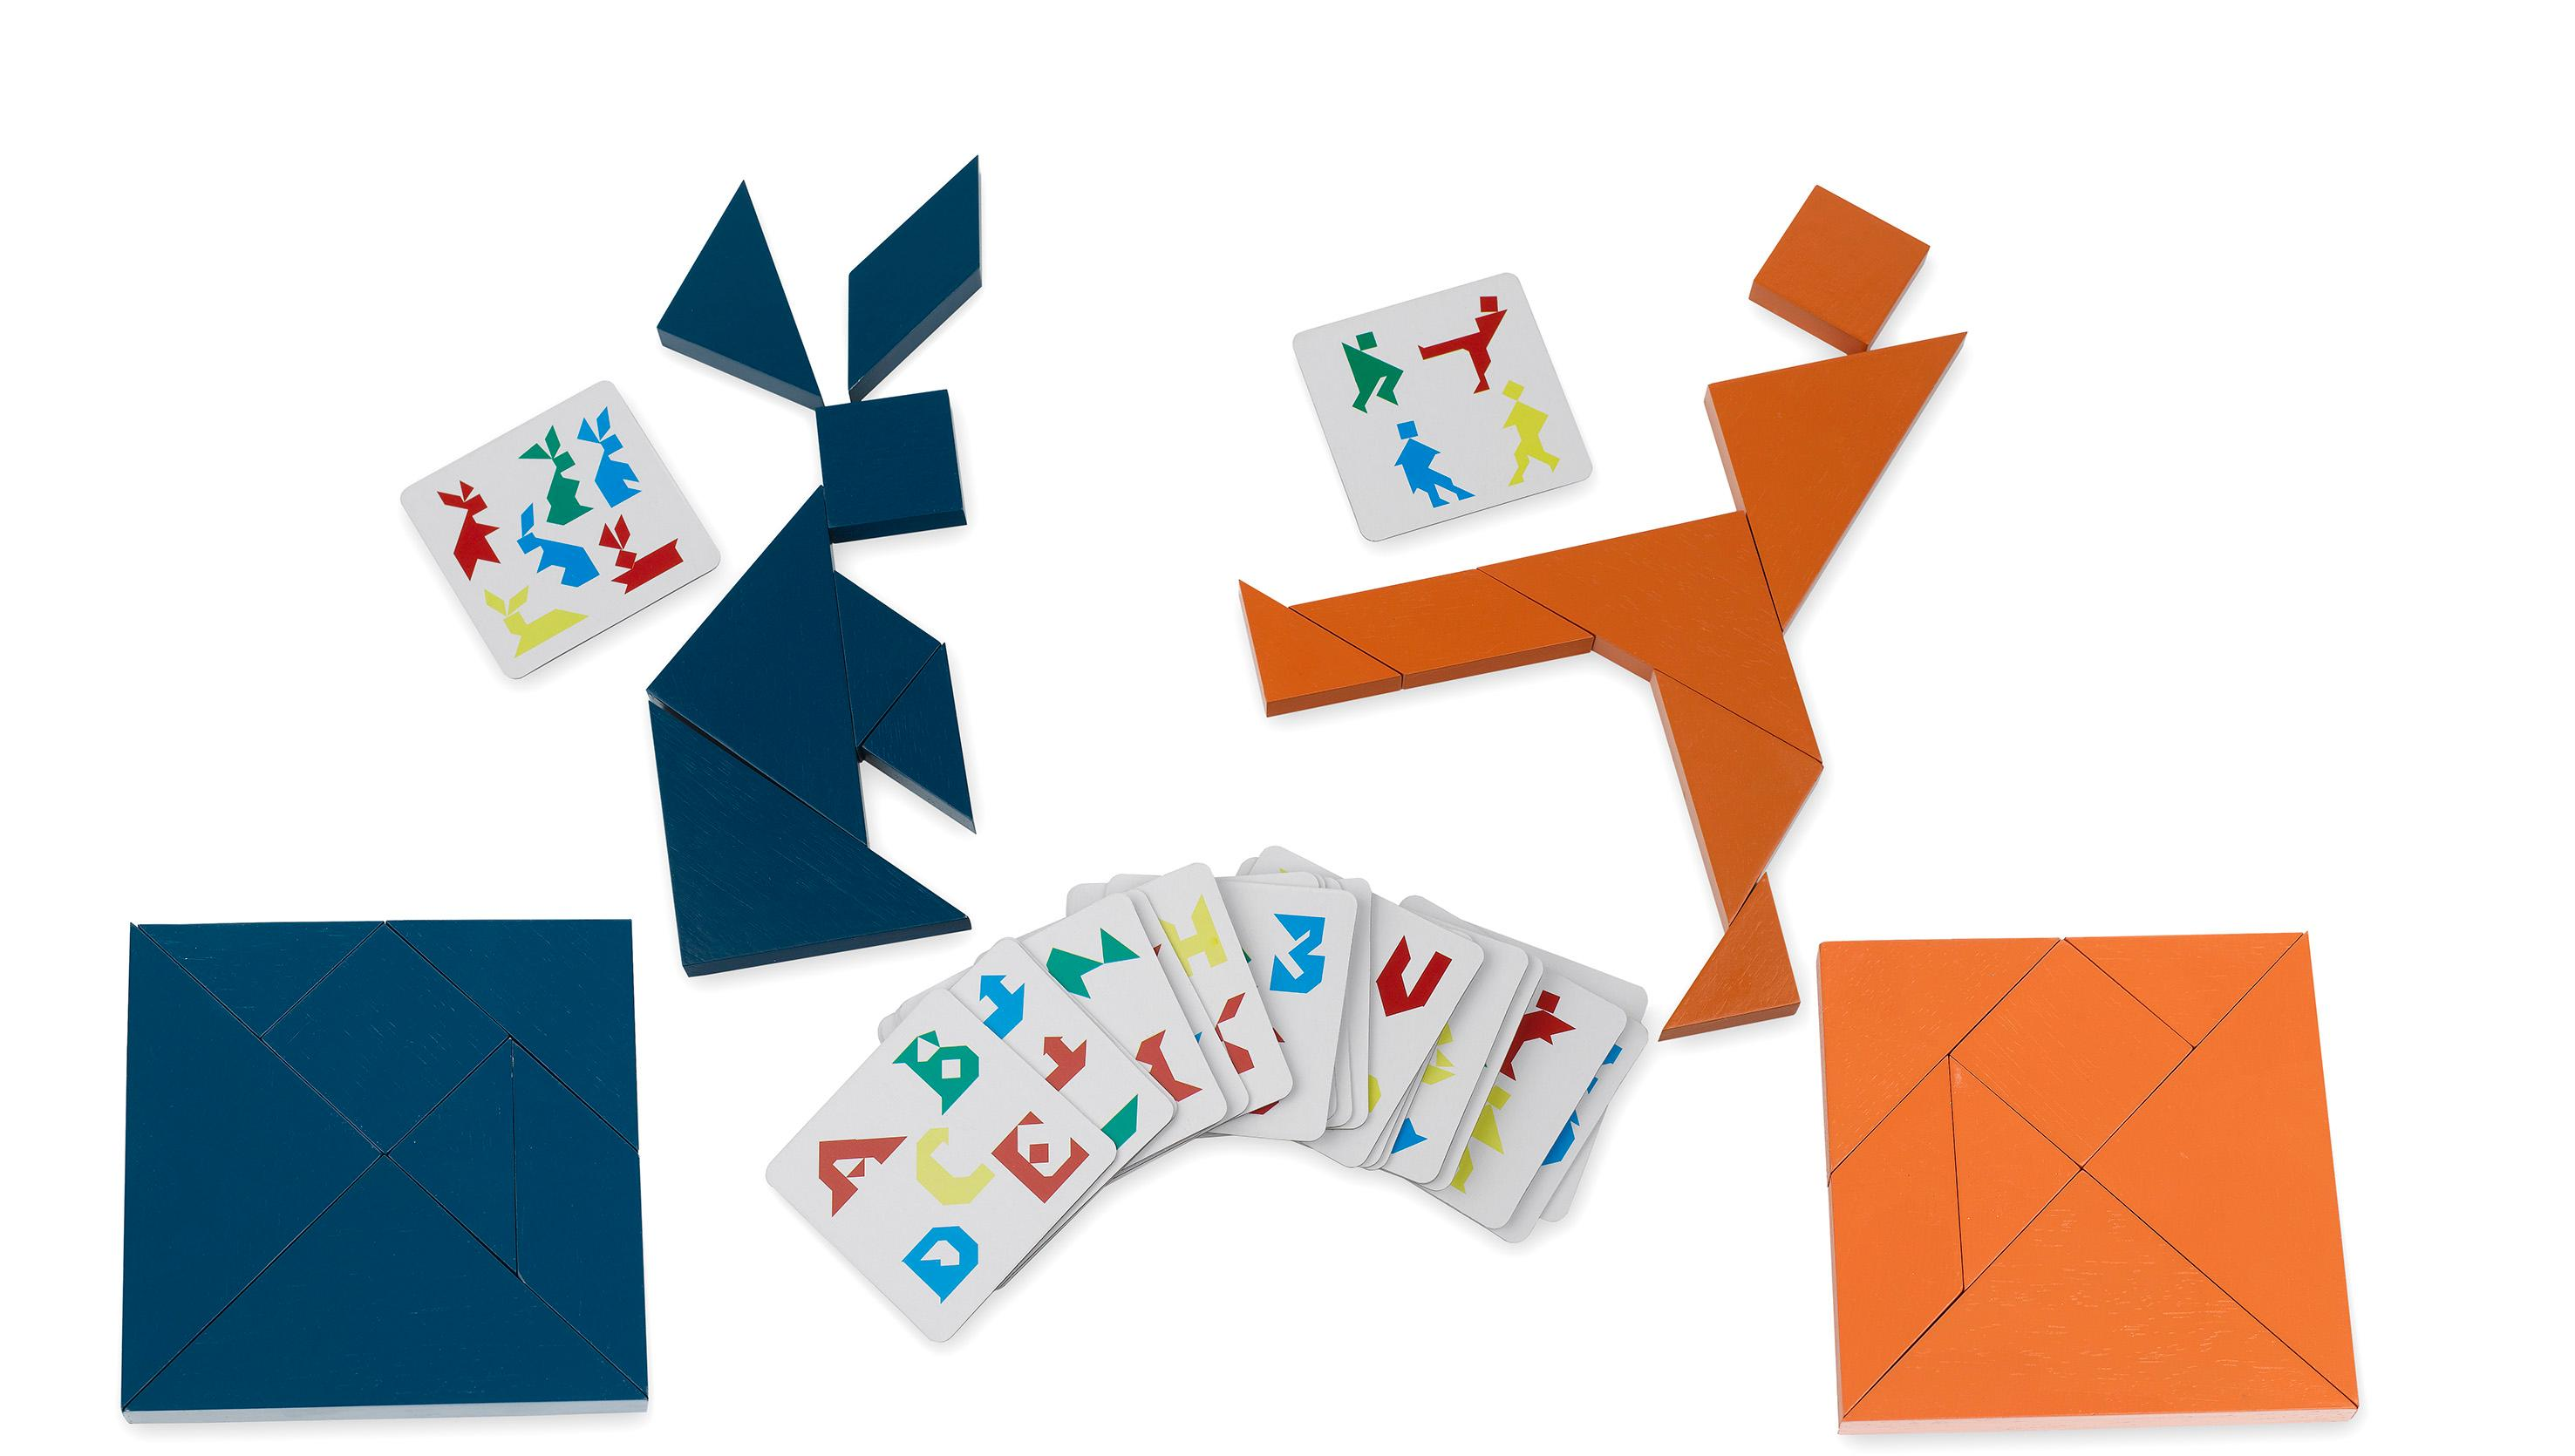 Aquamarine Games - Tangram Doble en Madera, Juego de